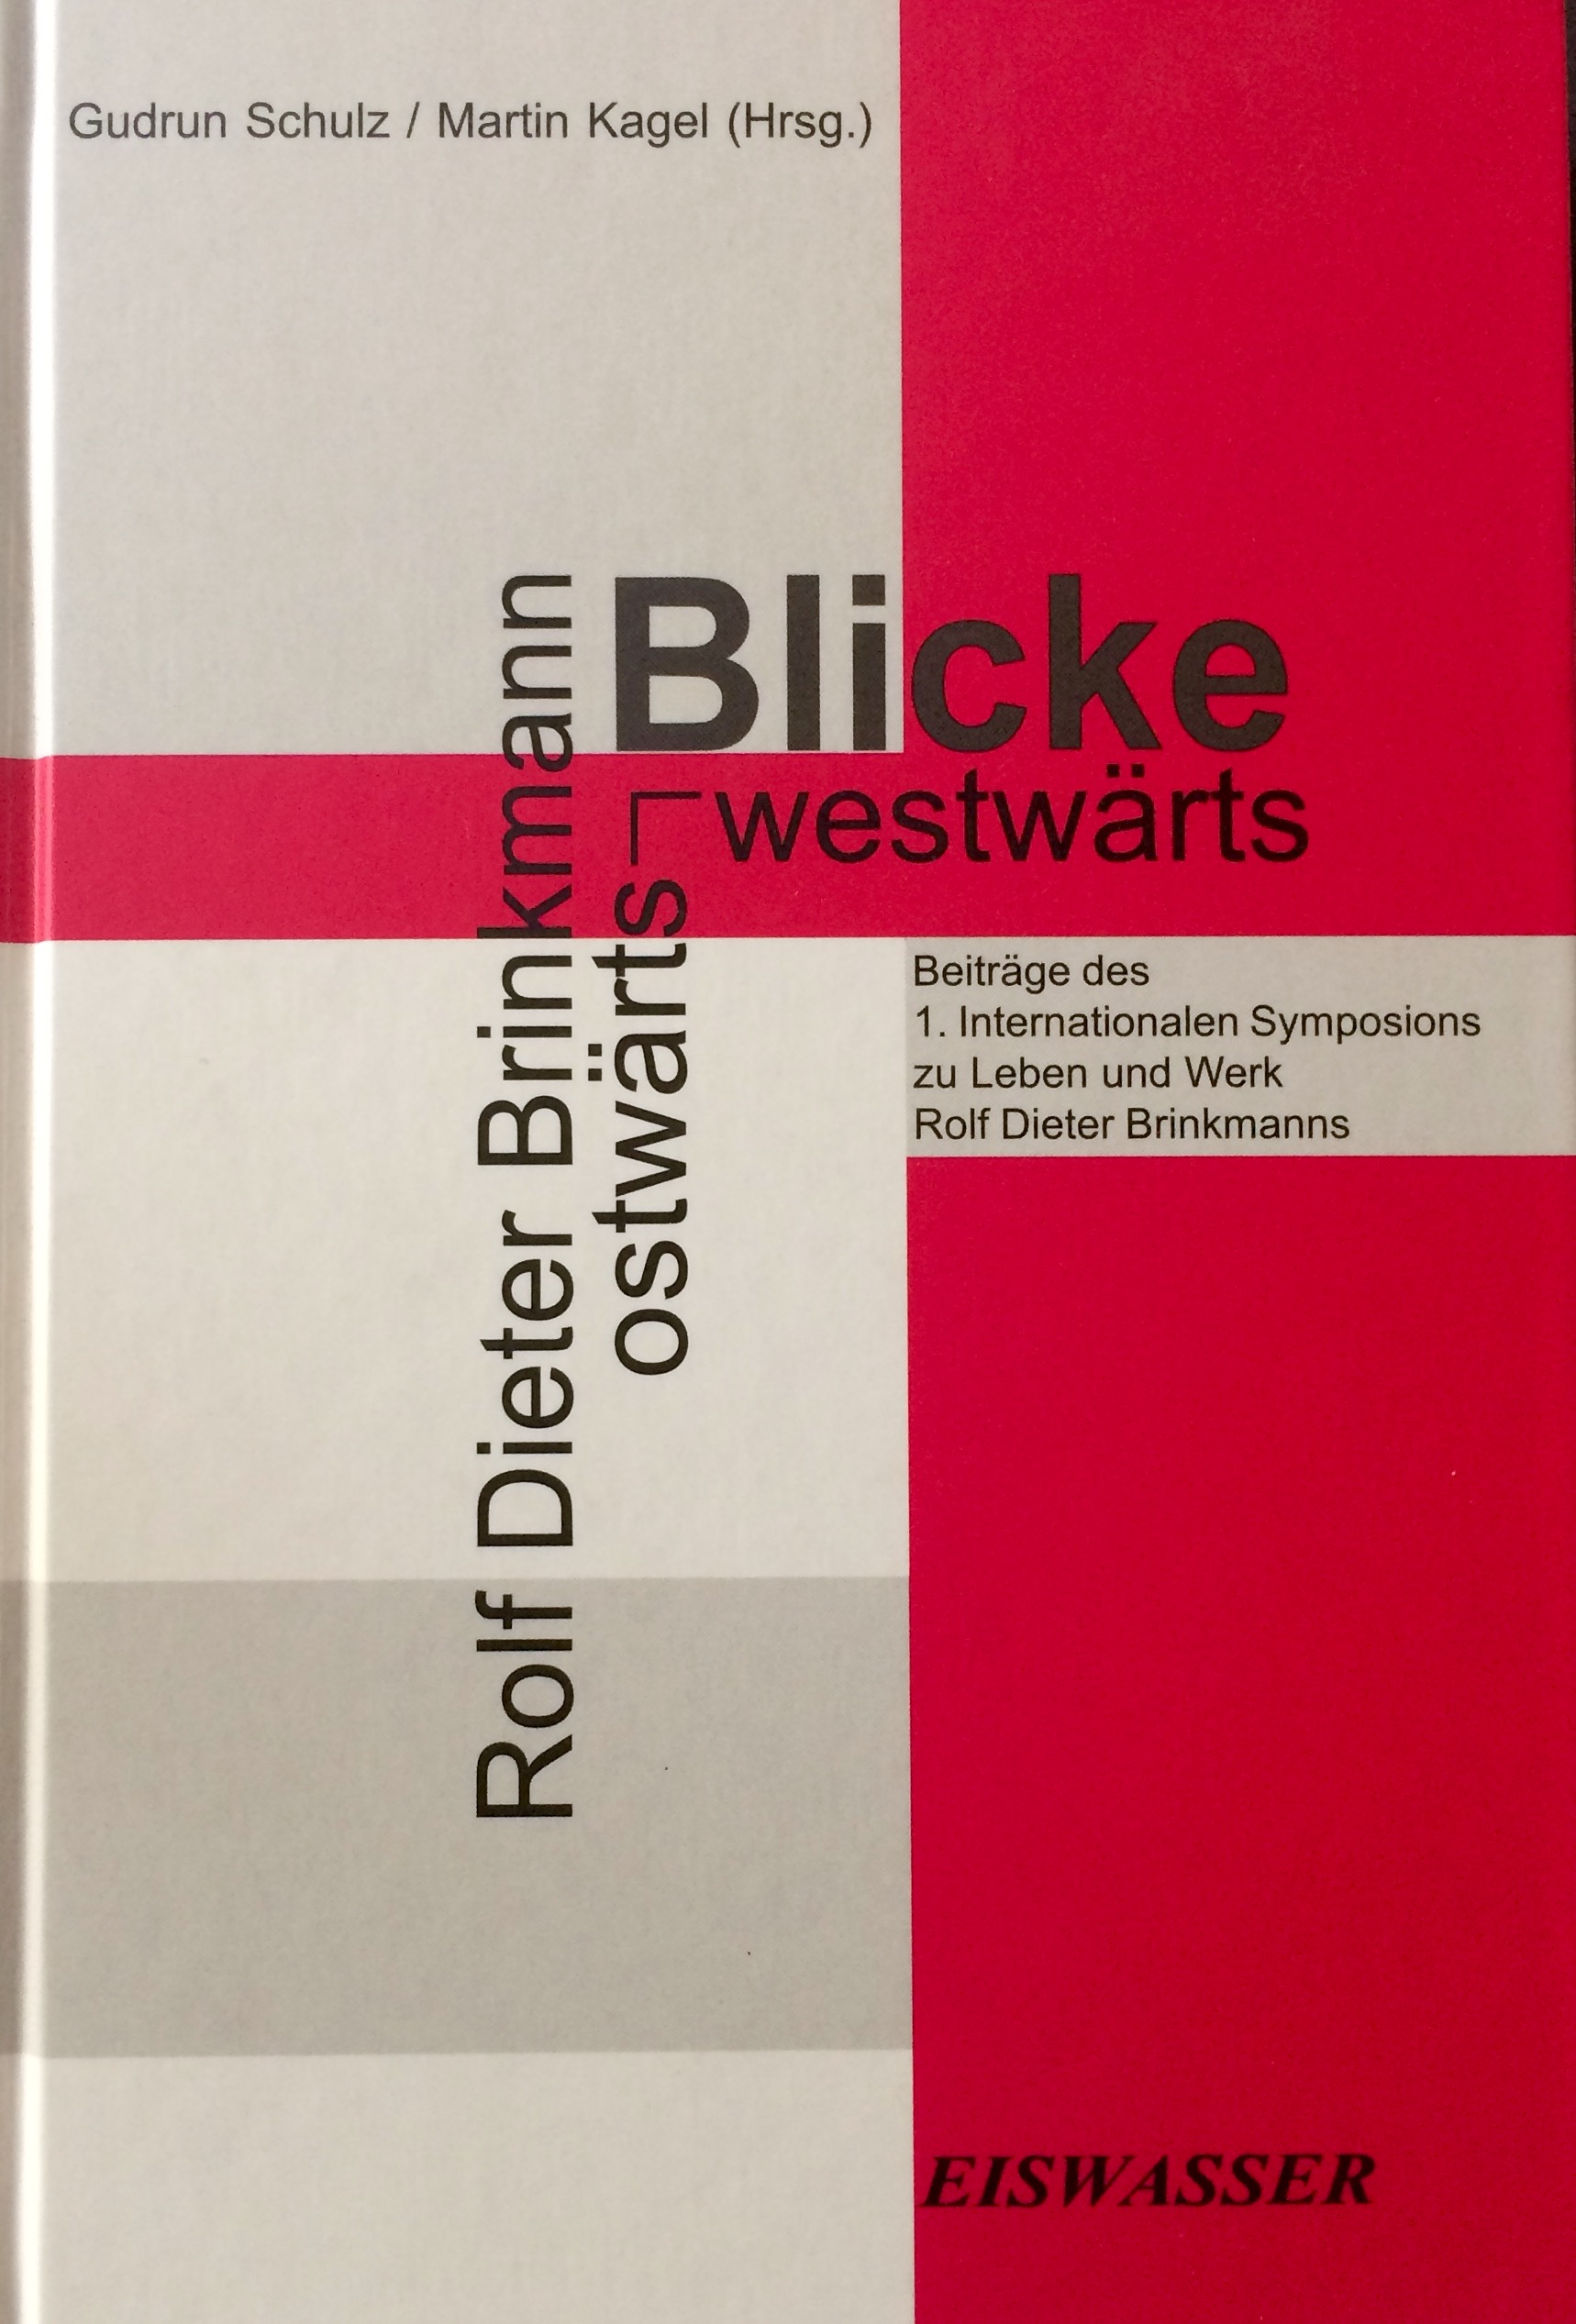 RDB-Cover_Symposium Vechta 2001